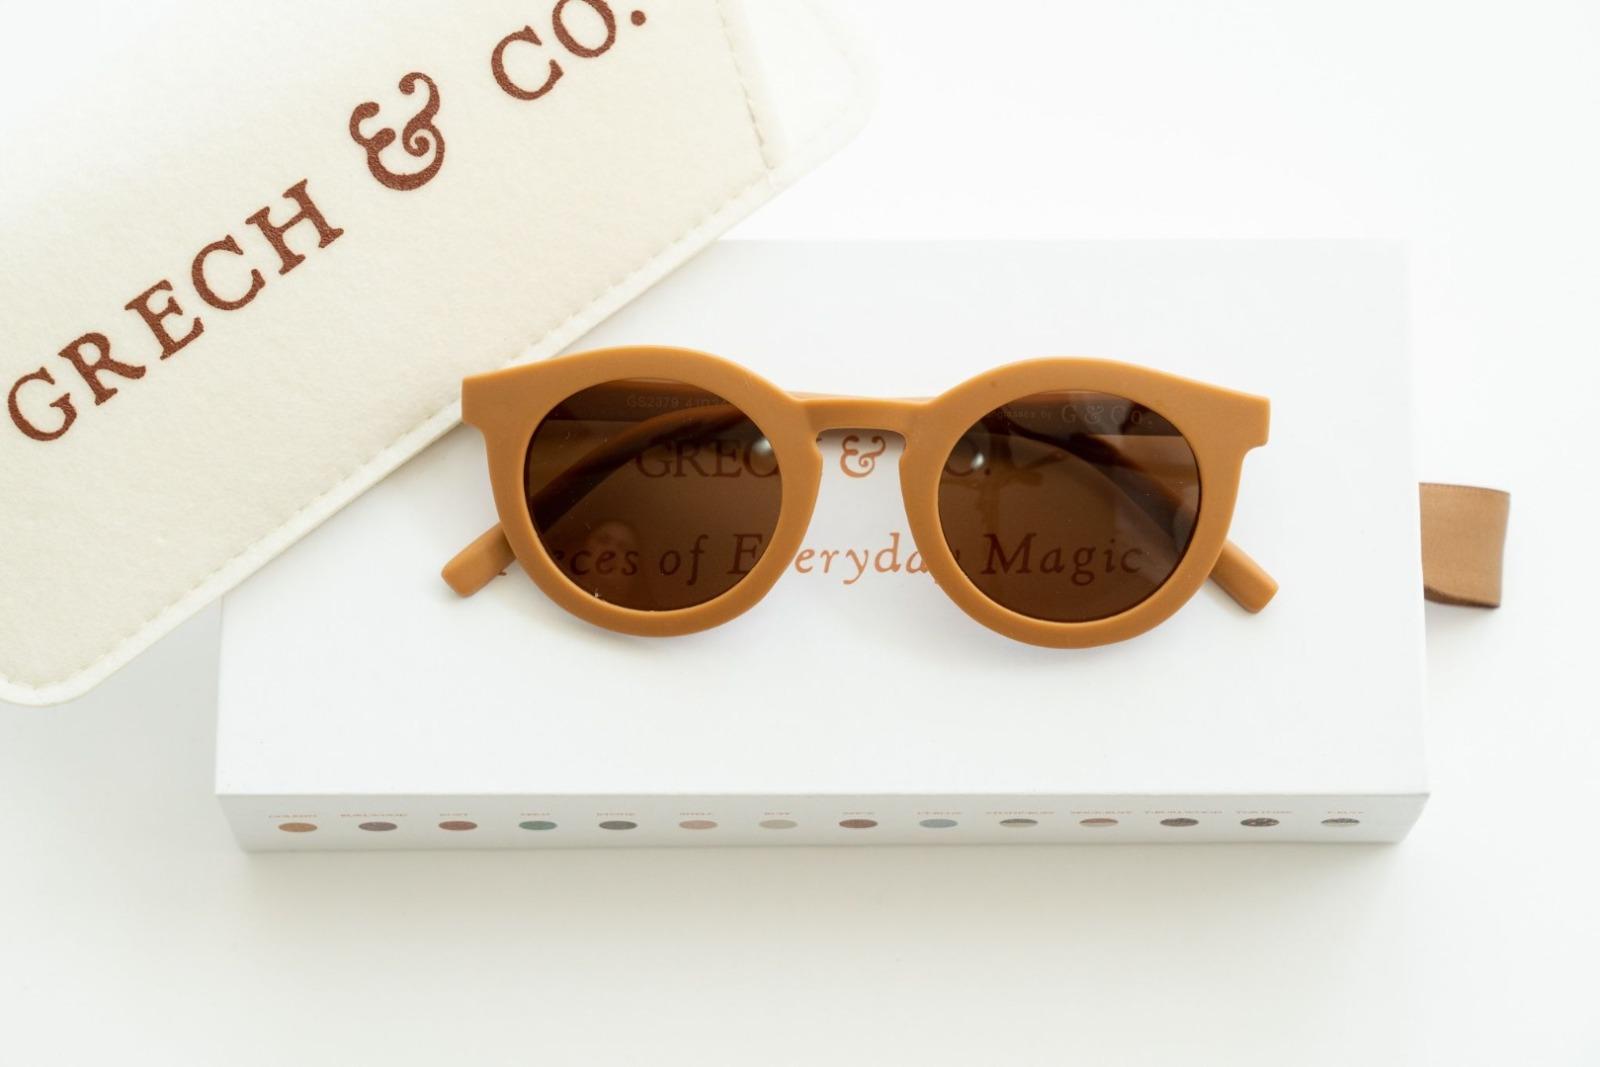 Sonnenbrille Polarized Spice Grech & Co